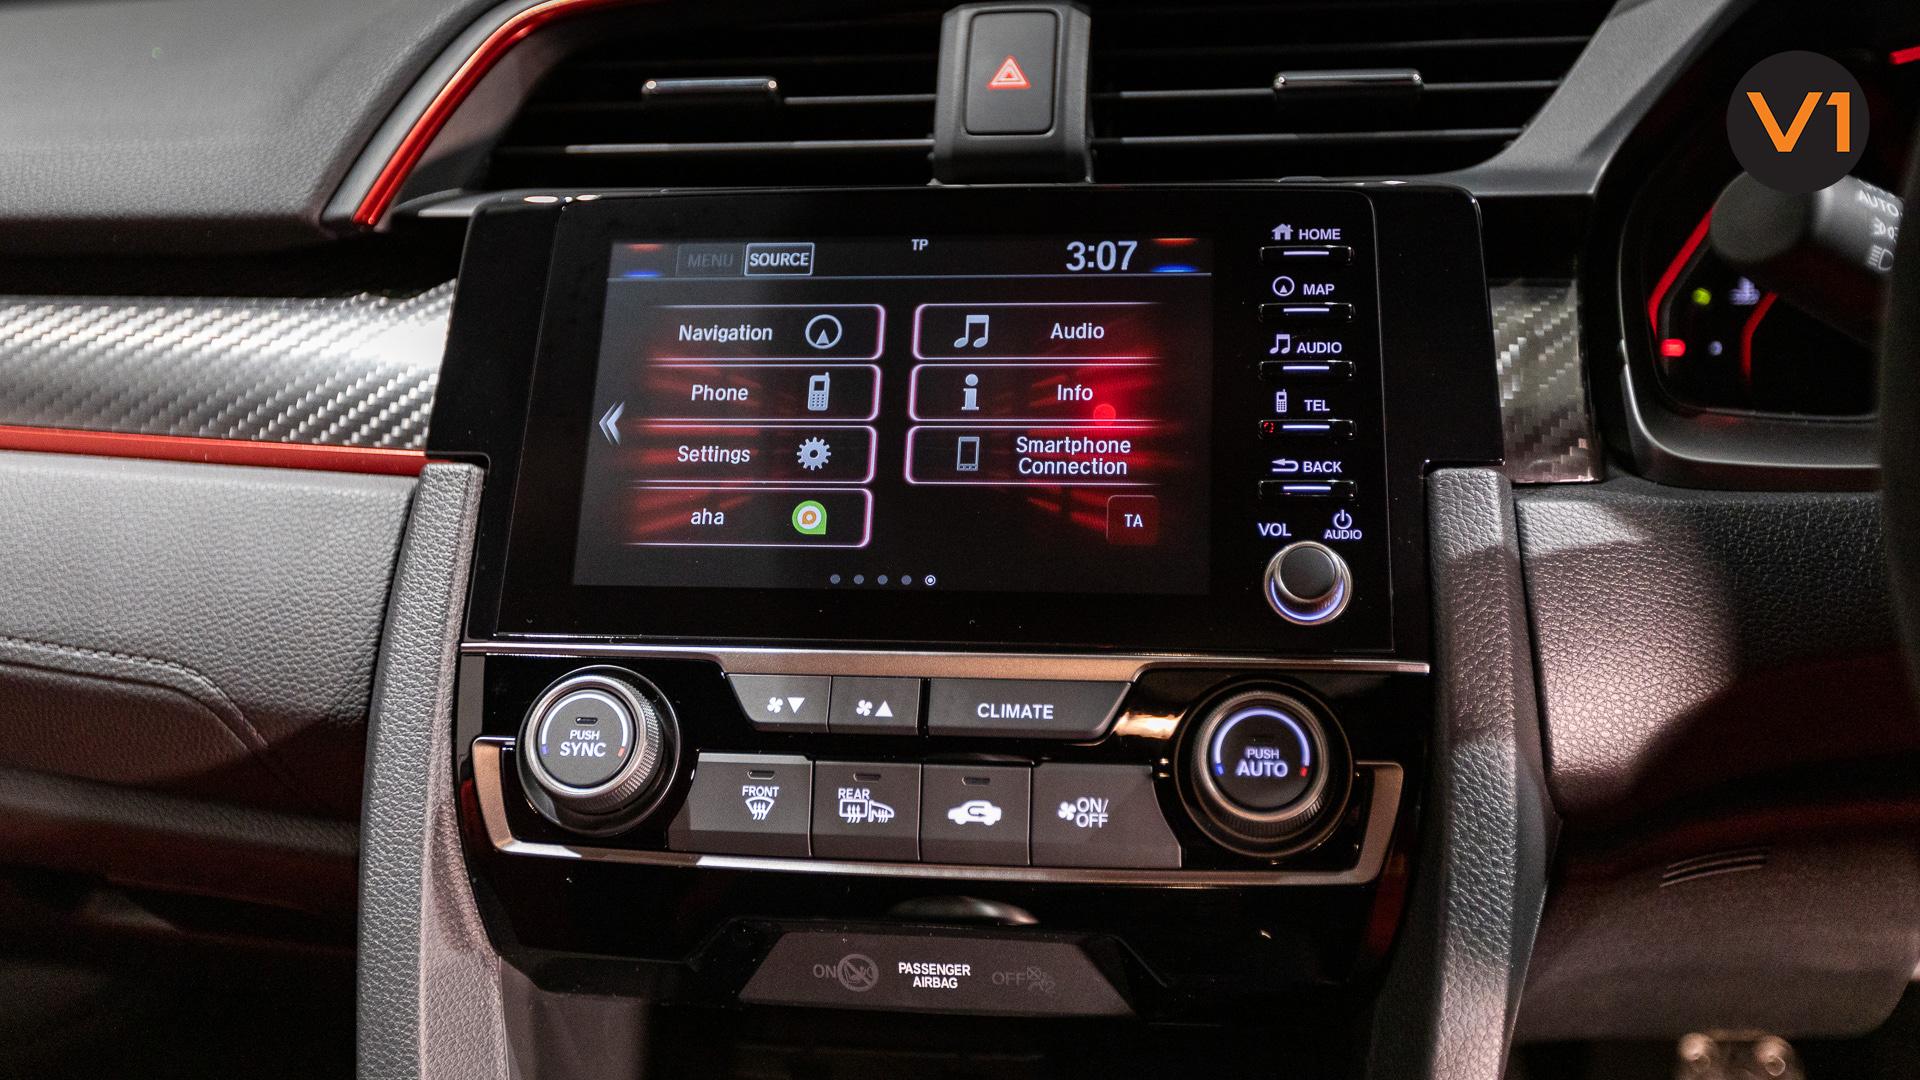 Honda Civic 2.0 Type R GT (FL2020) - Infotainment